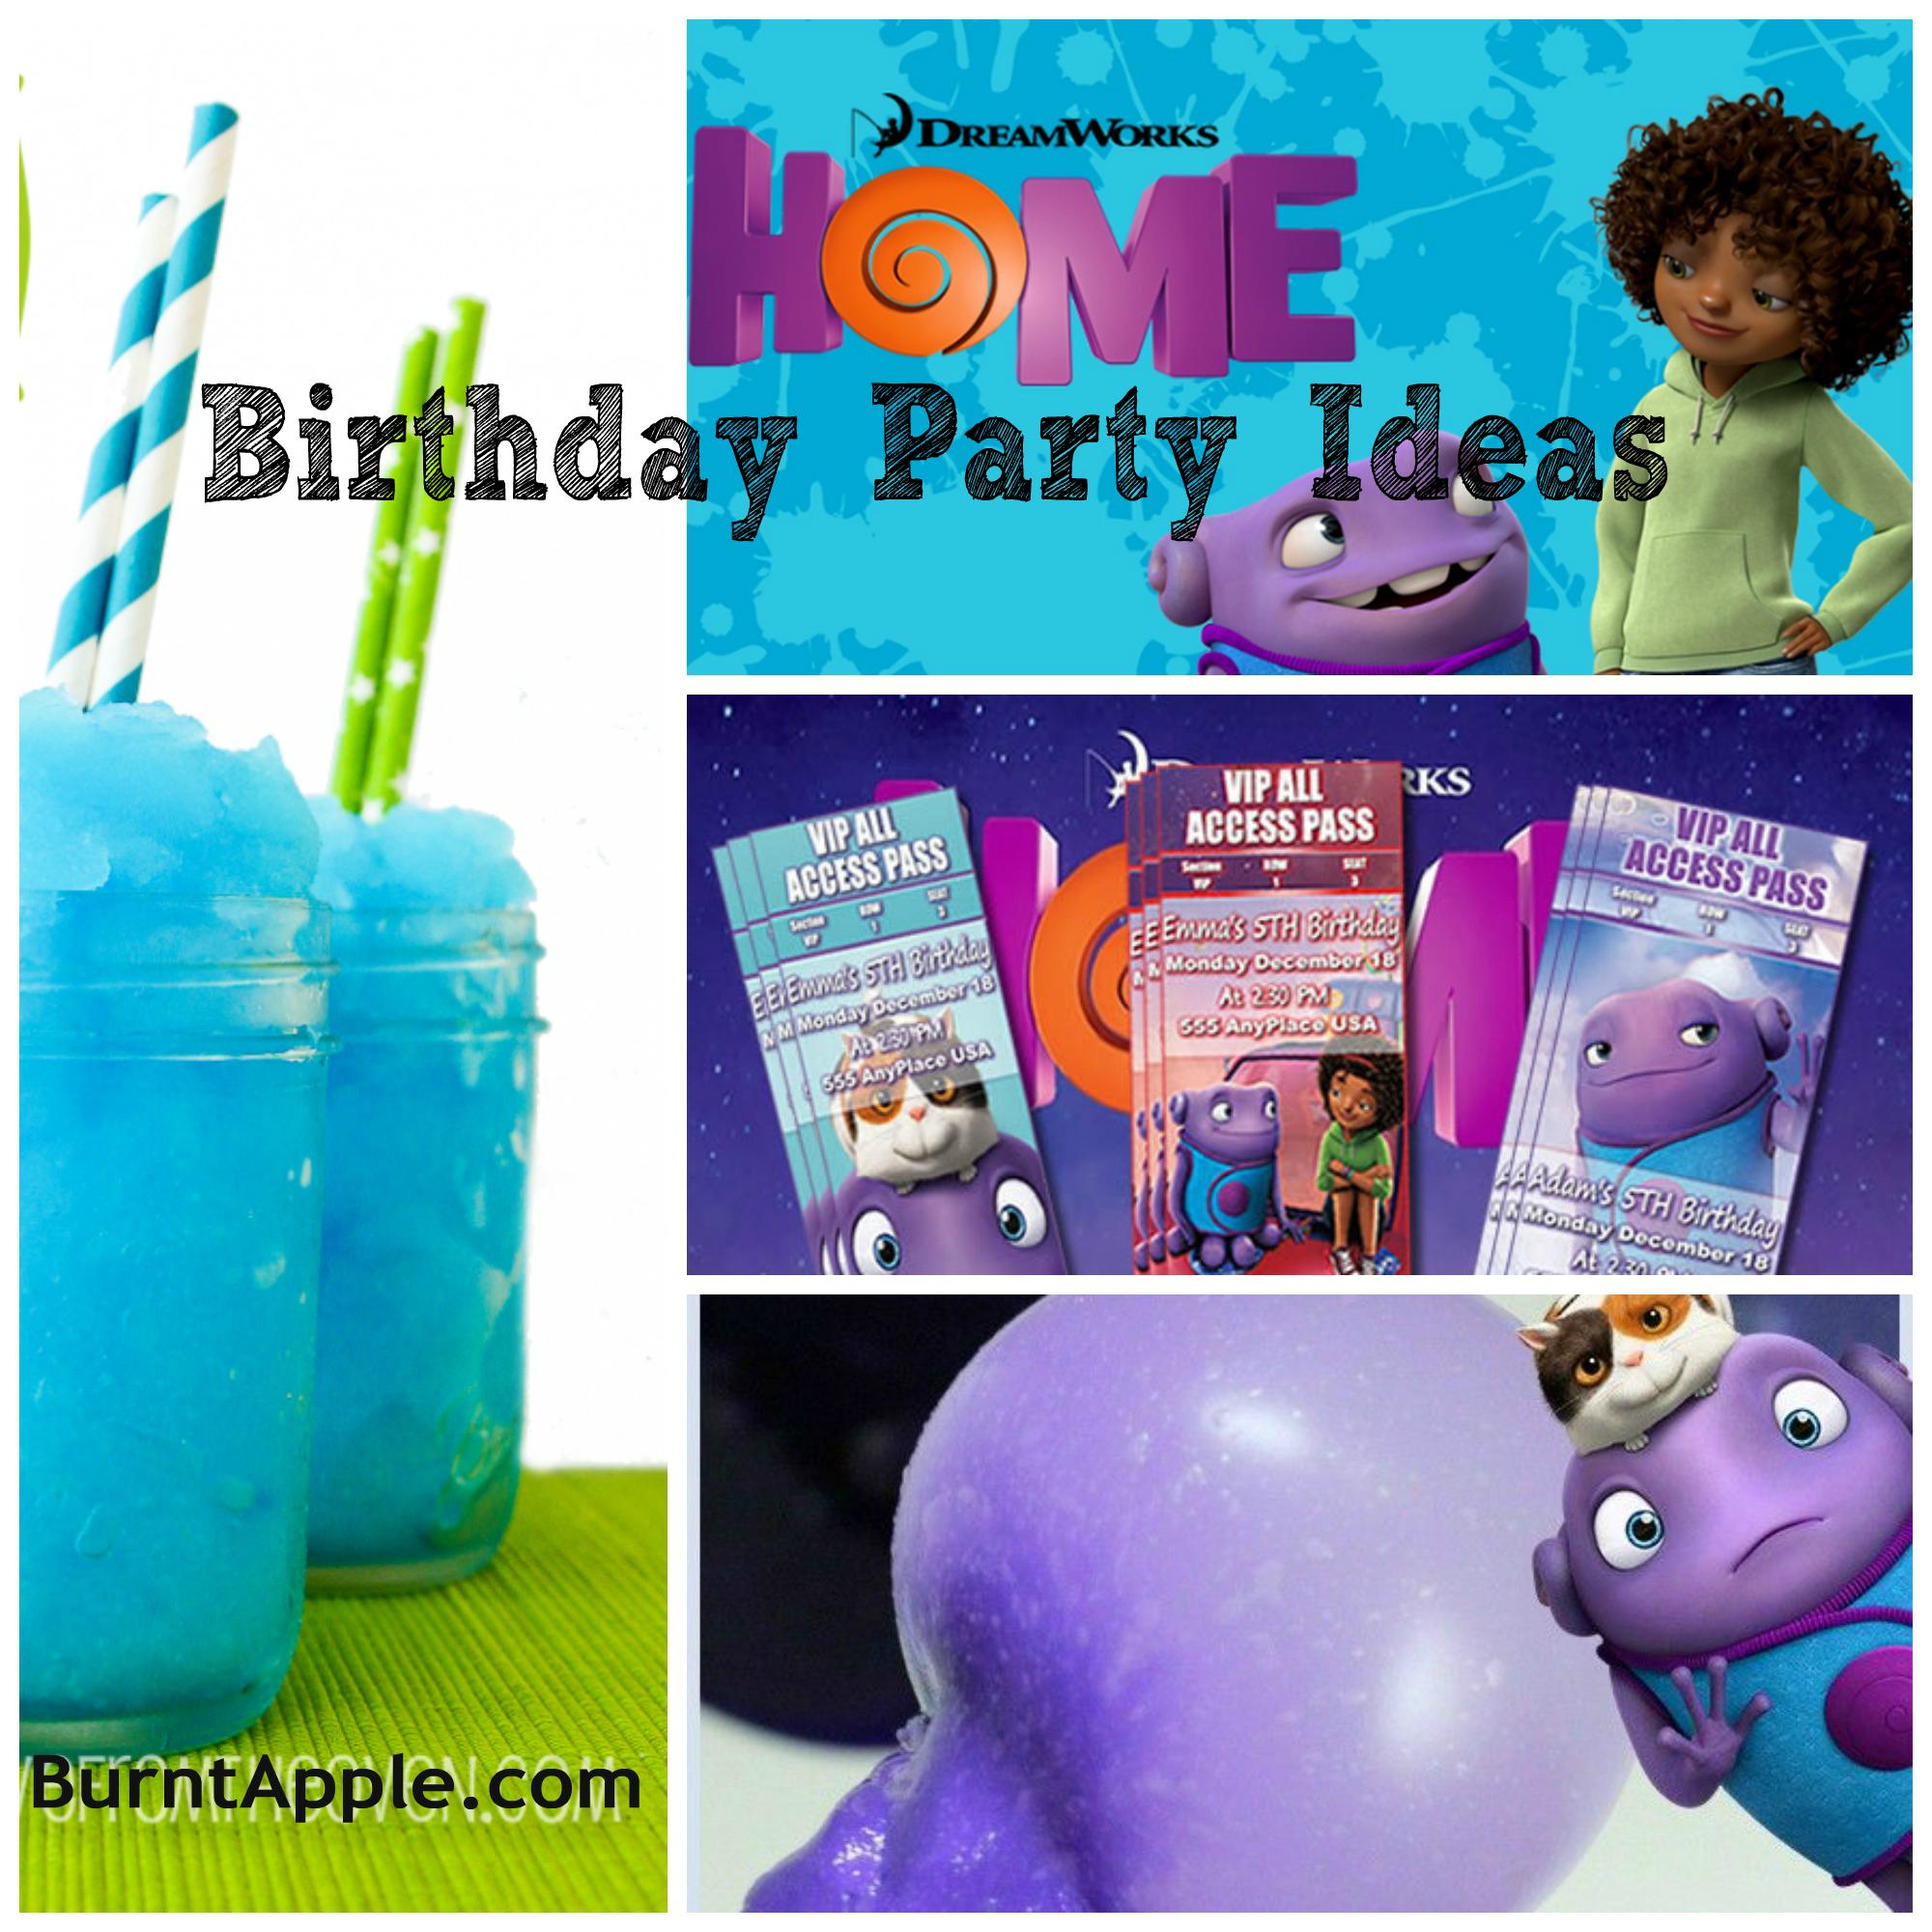 Dreamworks Home Birthday Party Ideas Burnt Apple